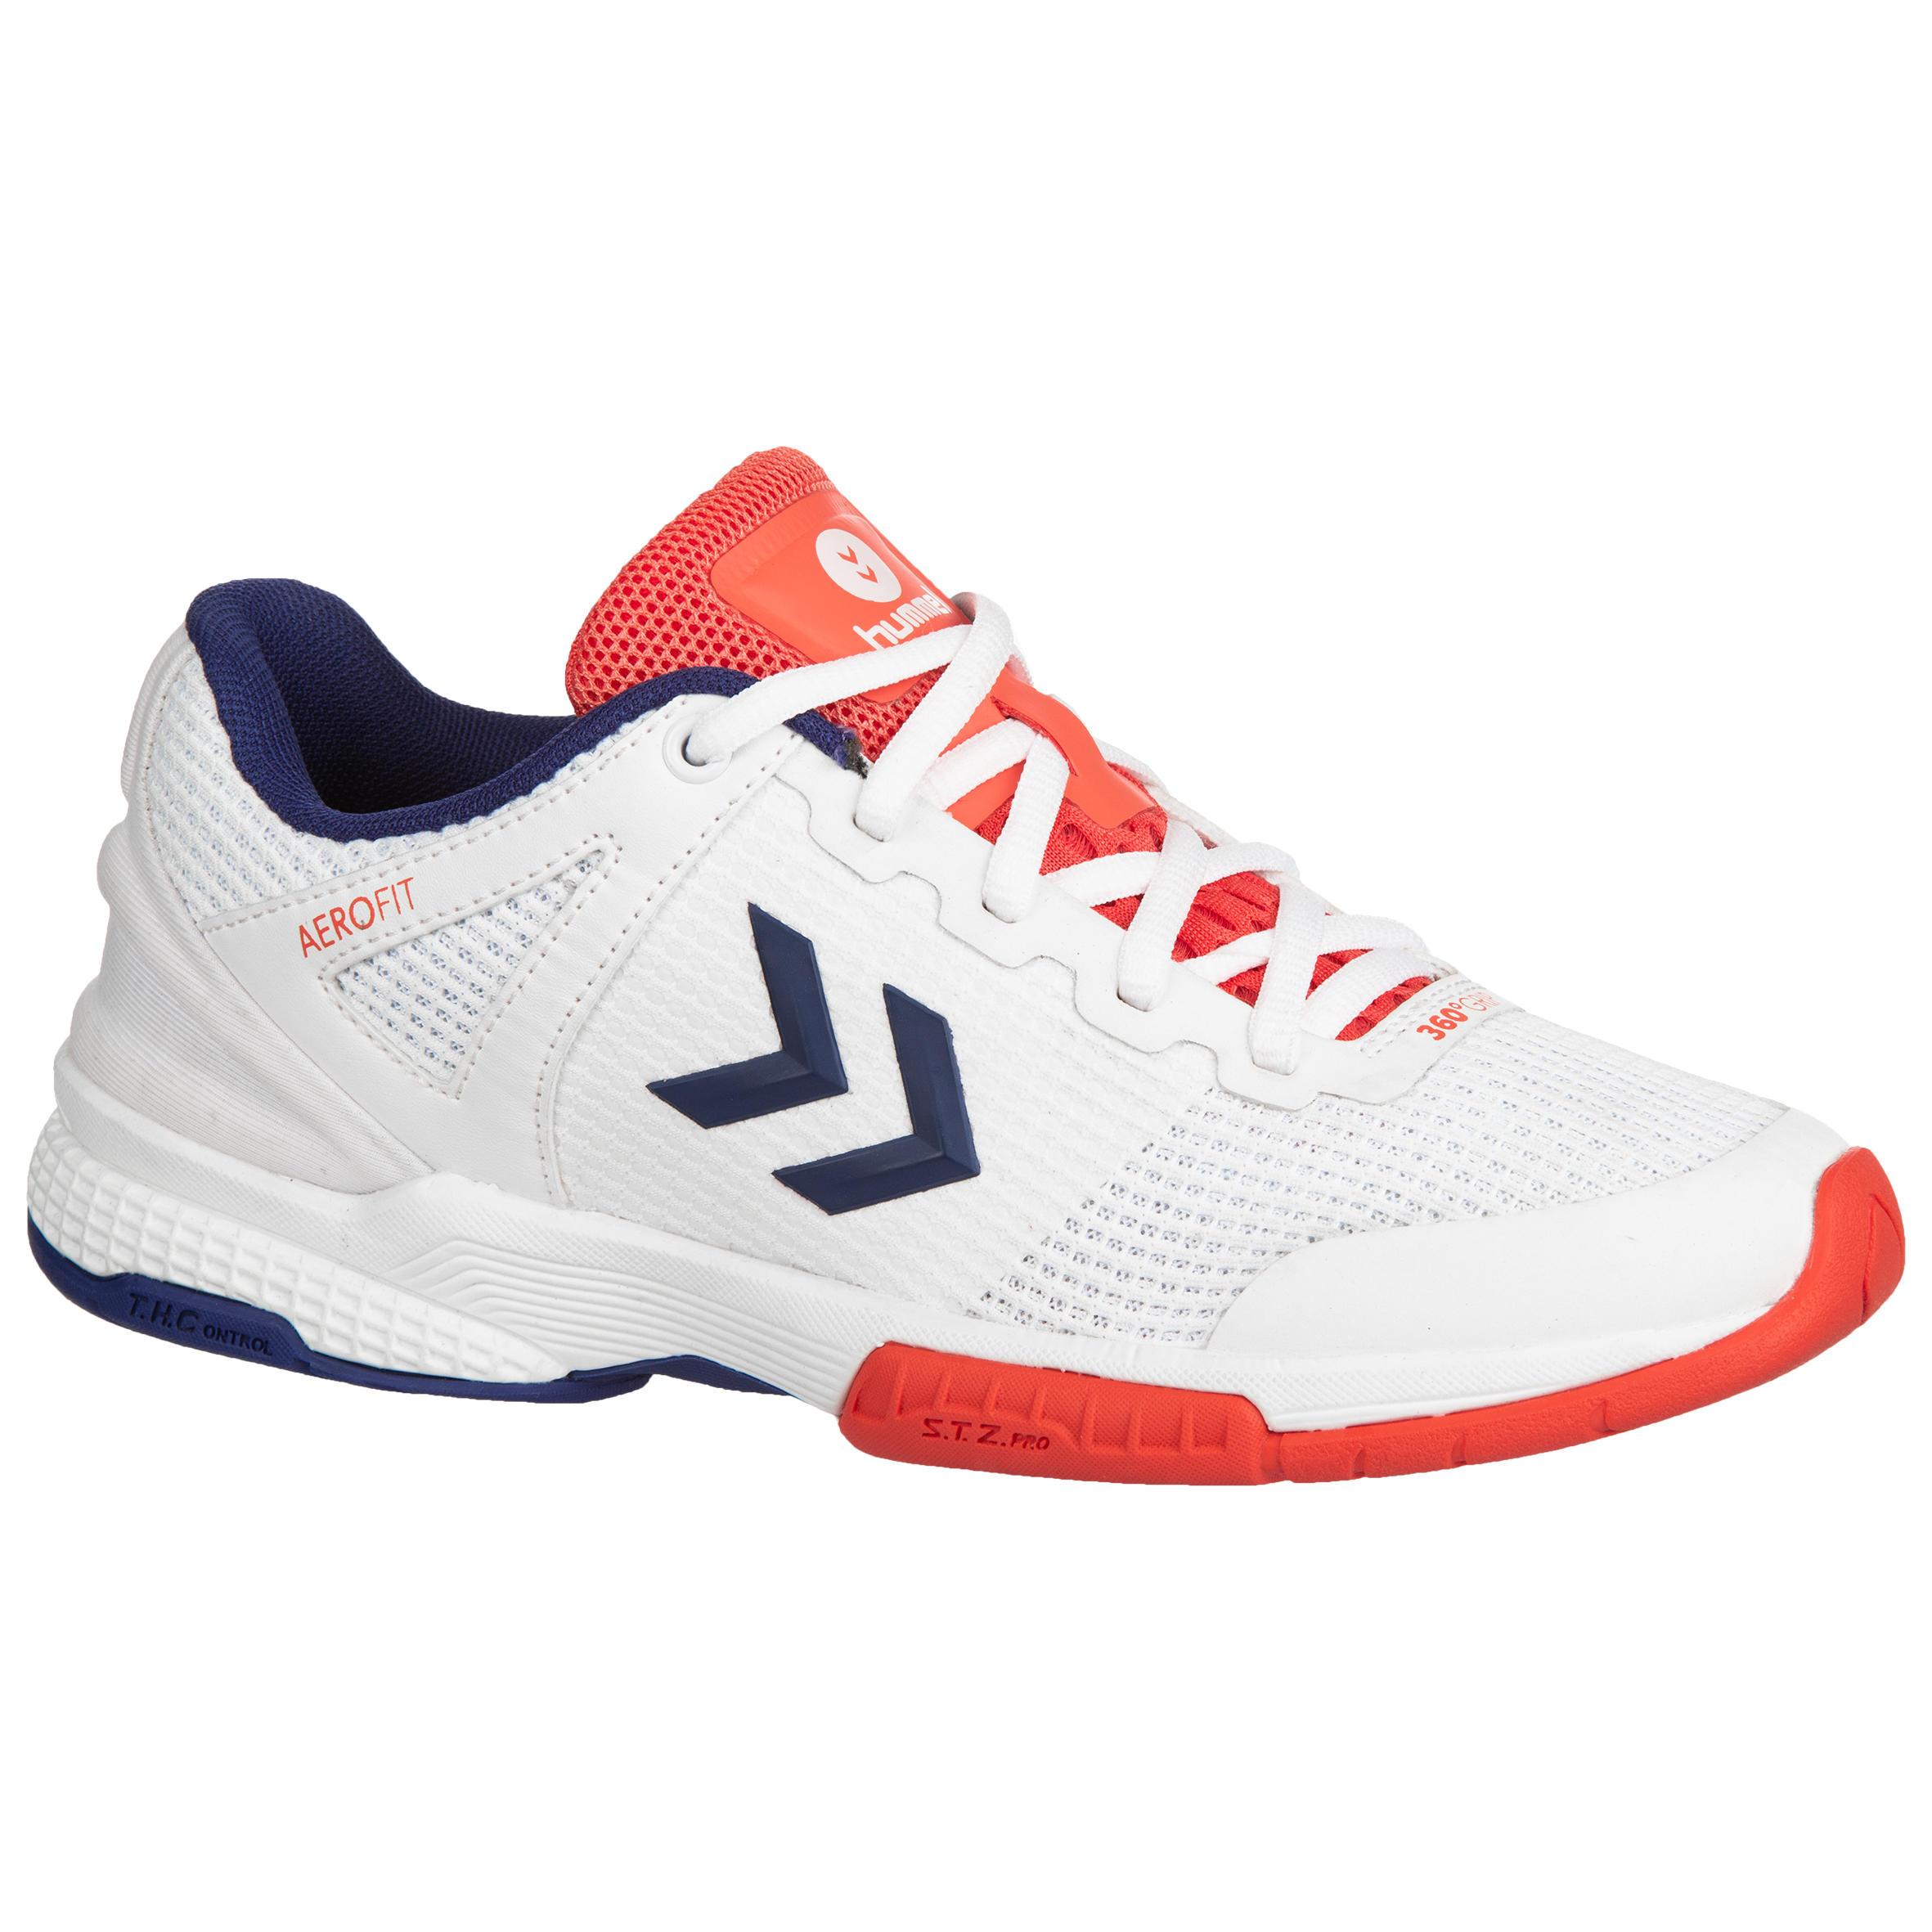 Handballschuhe Aerocharge HB180 Rely 3.0 weiß/blau/koralle | Schuhe > Sportschuhe > Handballschuhe | Hummel